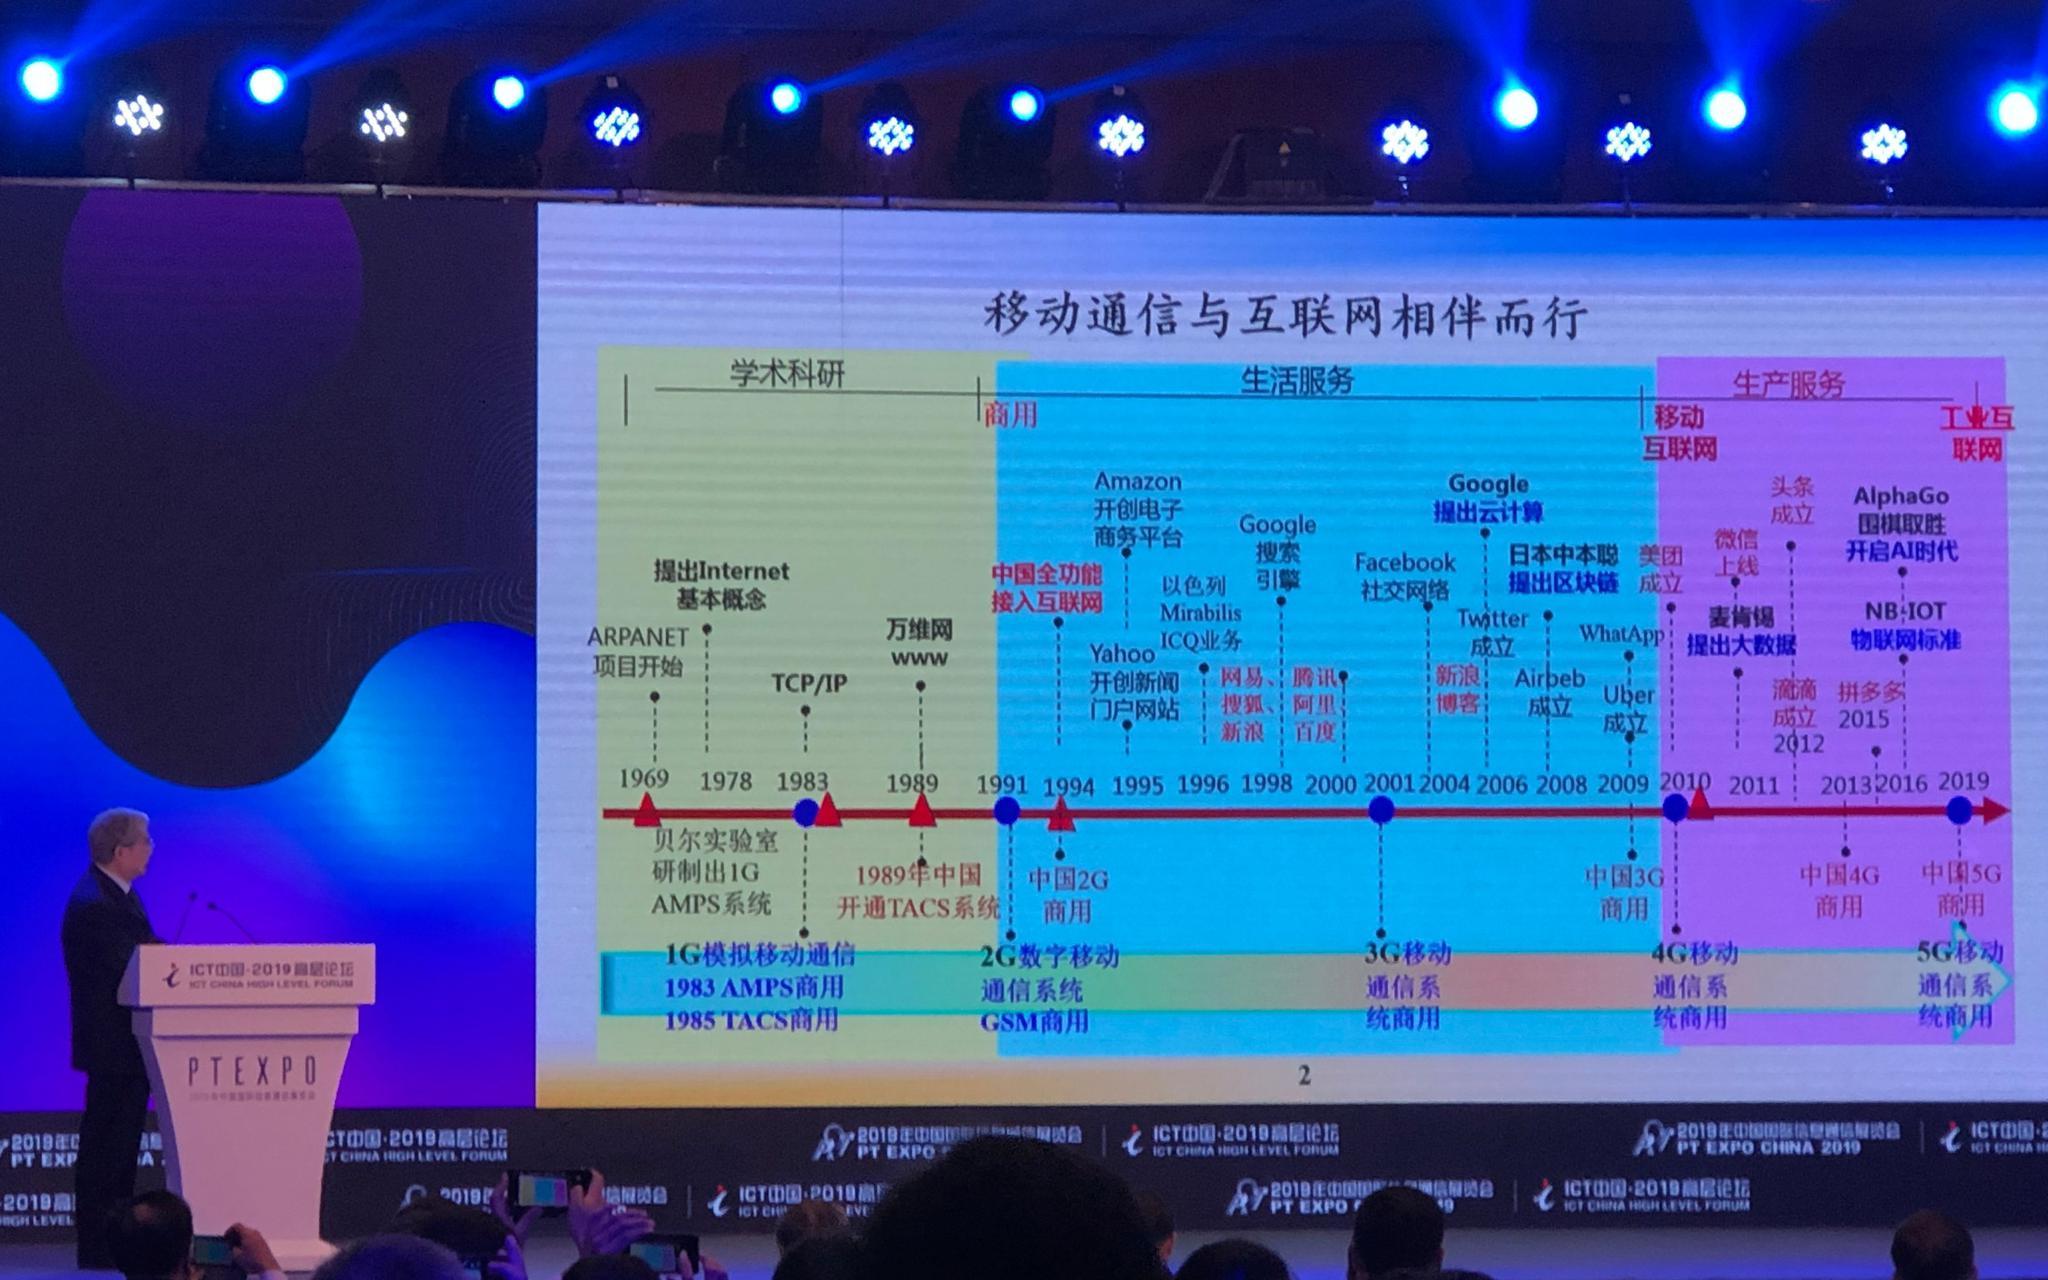 3u娱乐注册网址 科创板日报丨华兴源创拟购买欧立通股权;12月TV面板价格与11月持平